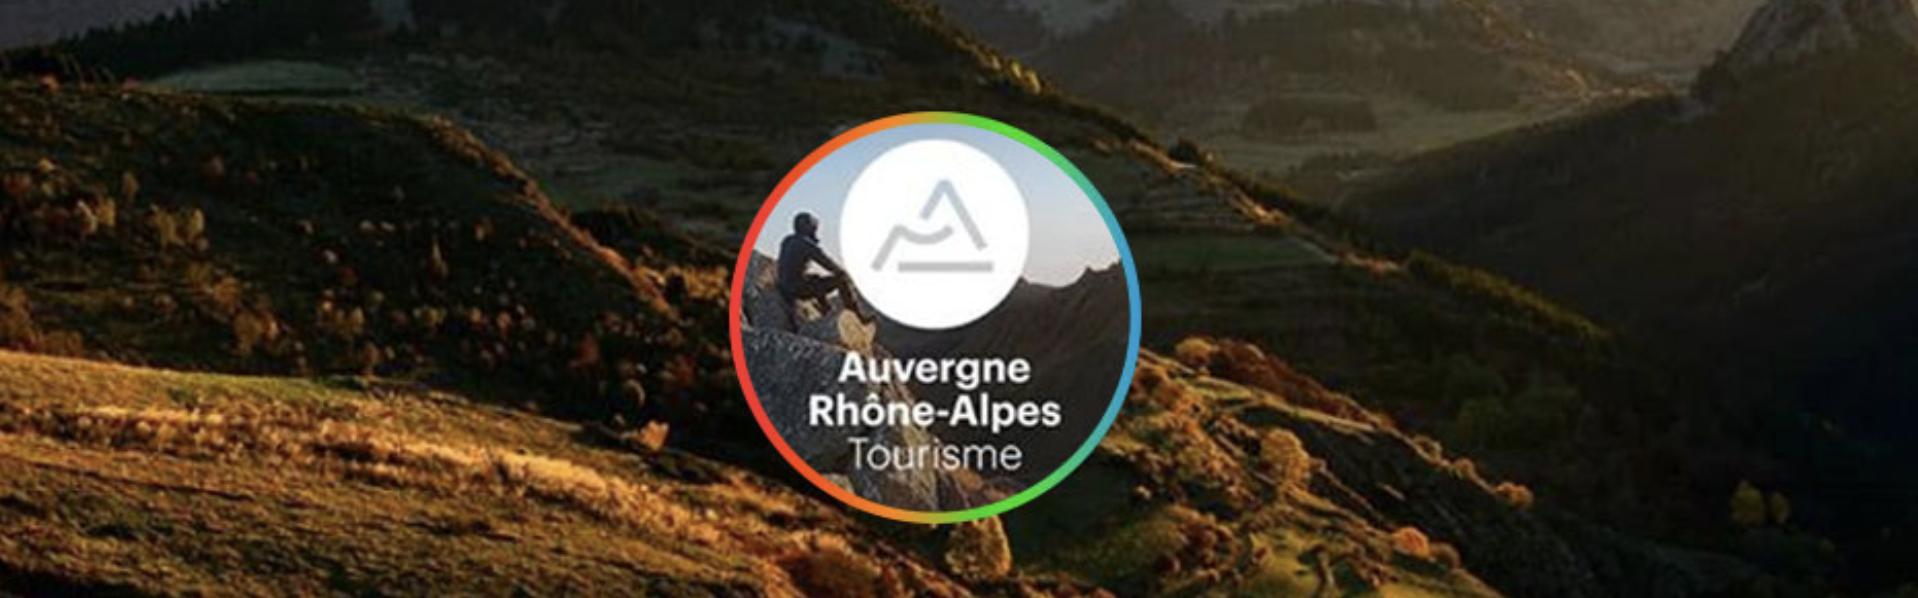 auvergne-rhone-alpes-tourisme-interview-socialmedia